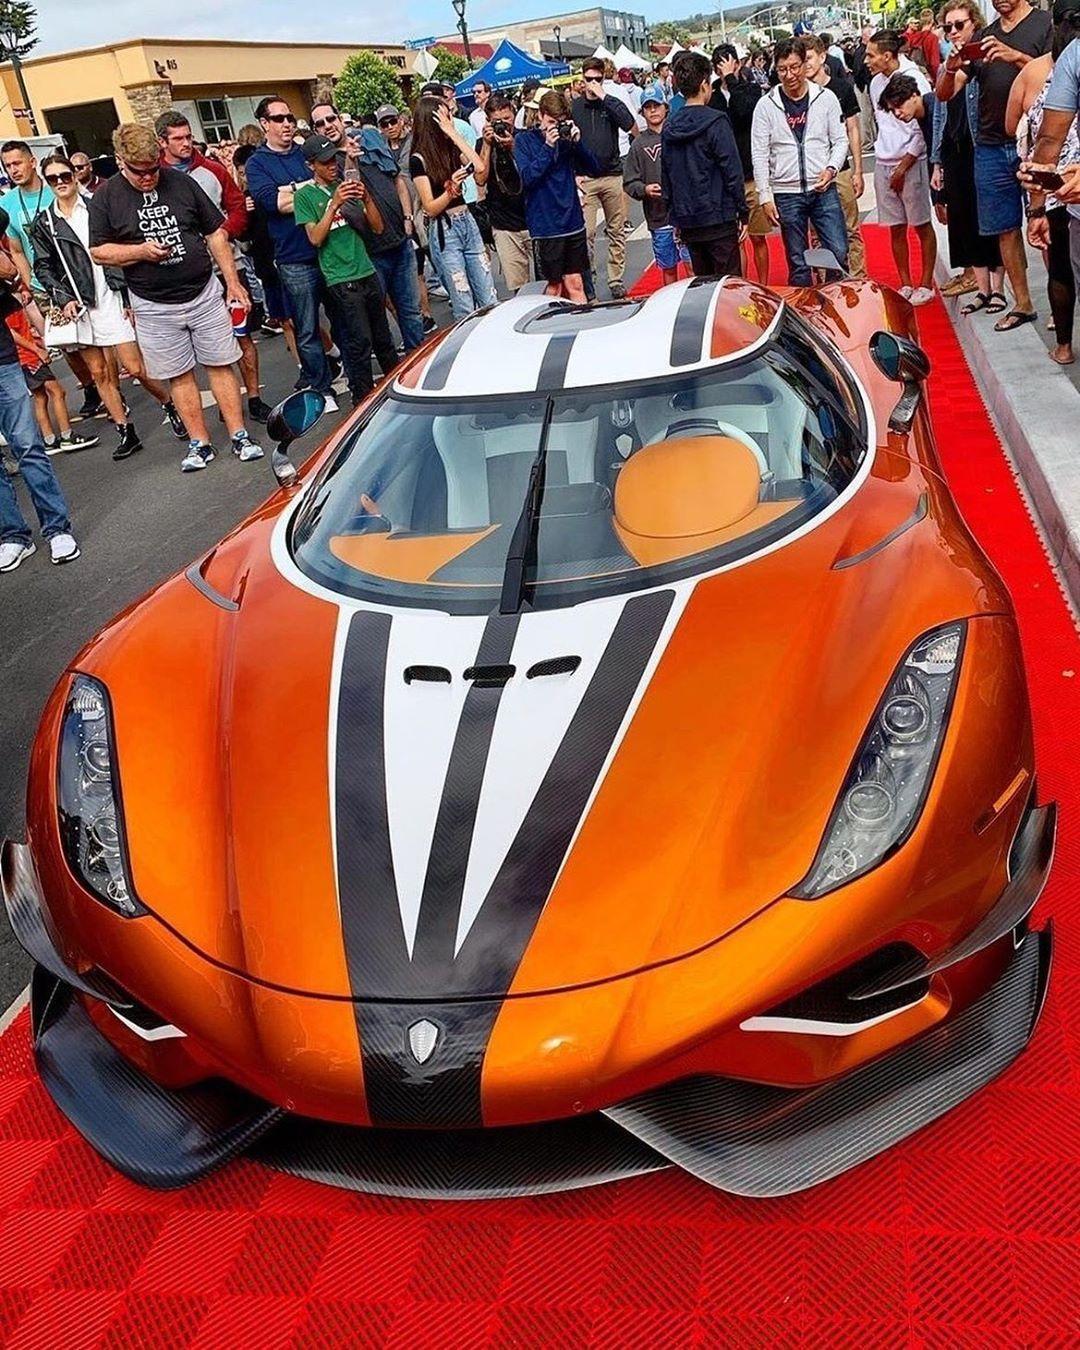 Amojunn Cars /// Concept Cars Drawing sportcars